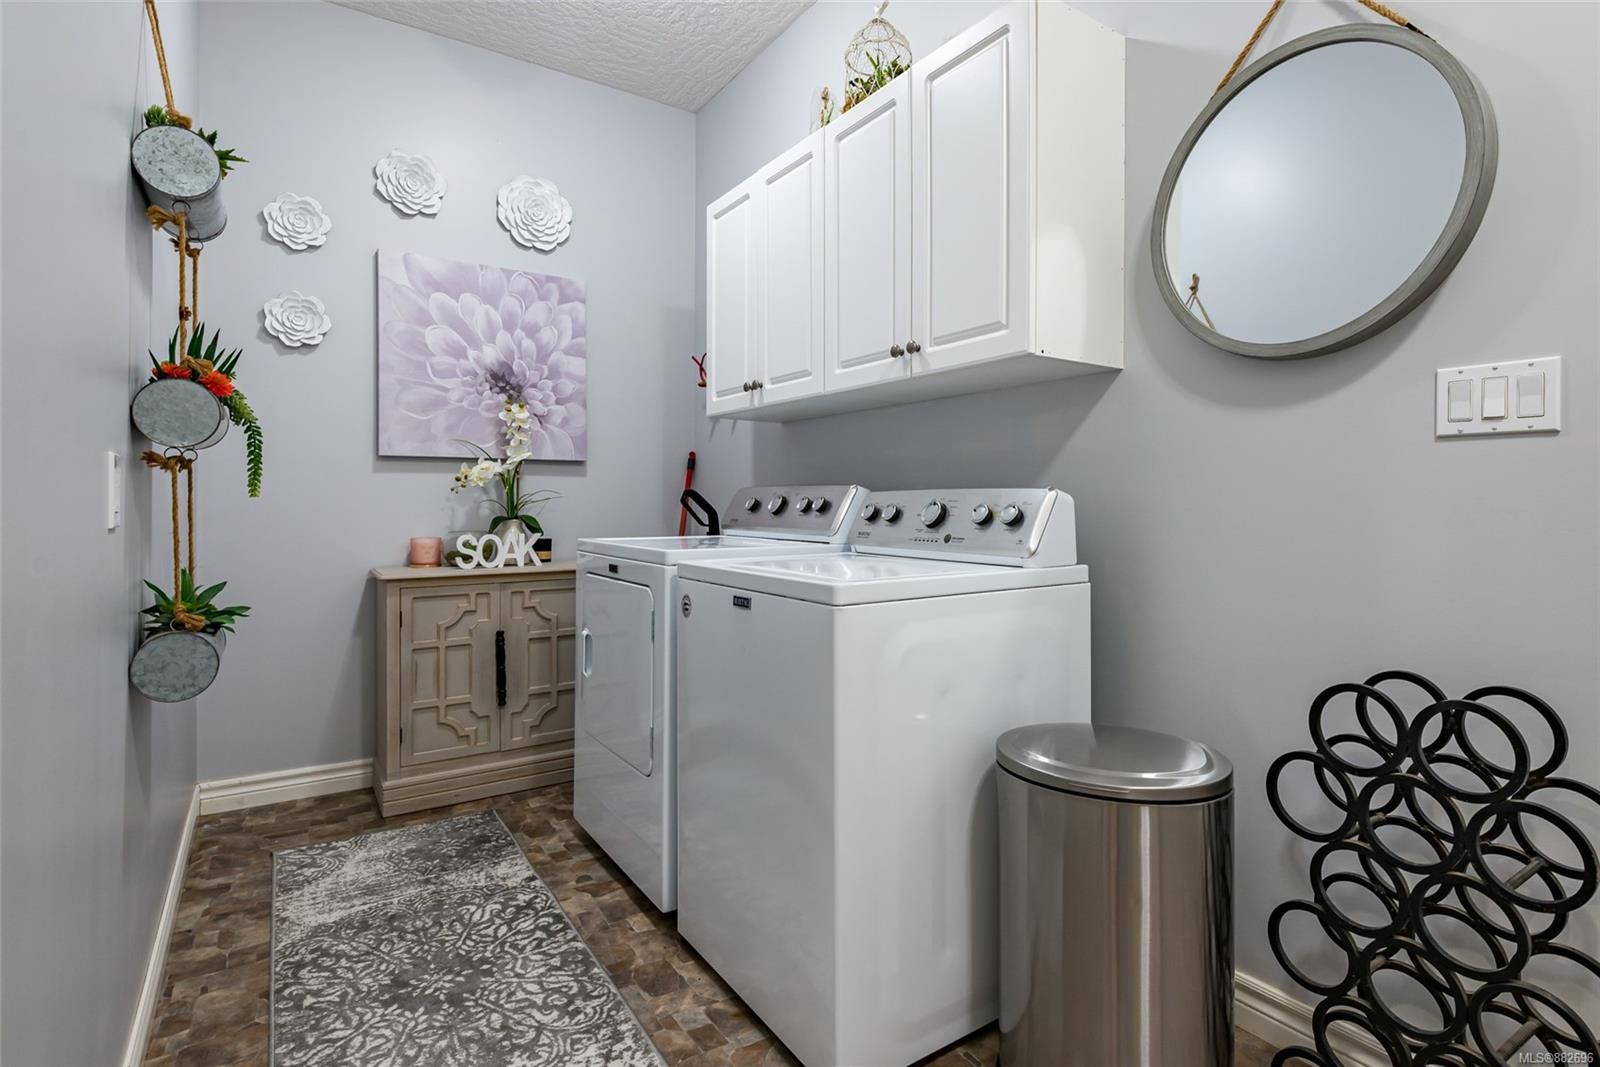 Photo 23: Photos: 3554 MacAulay Rd in : CV Merville Black Creek House for sale (Comox Valley)  : MLS®# 882696